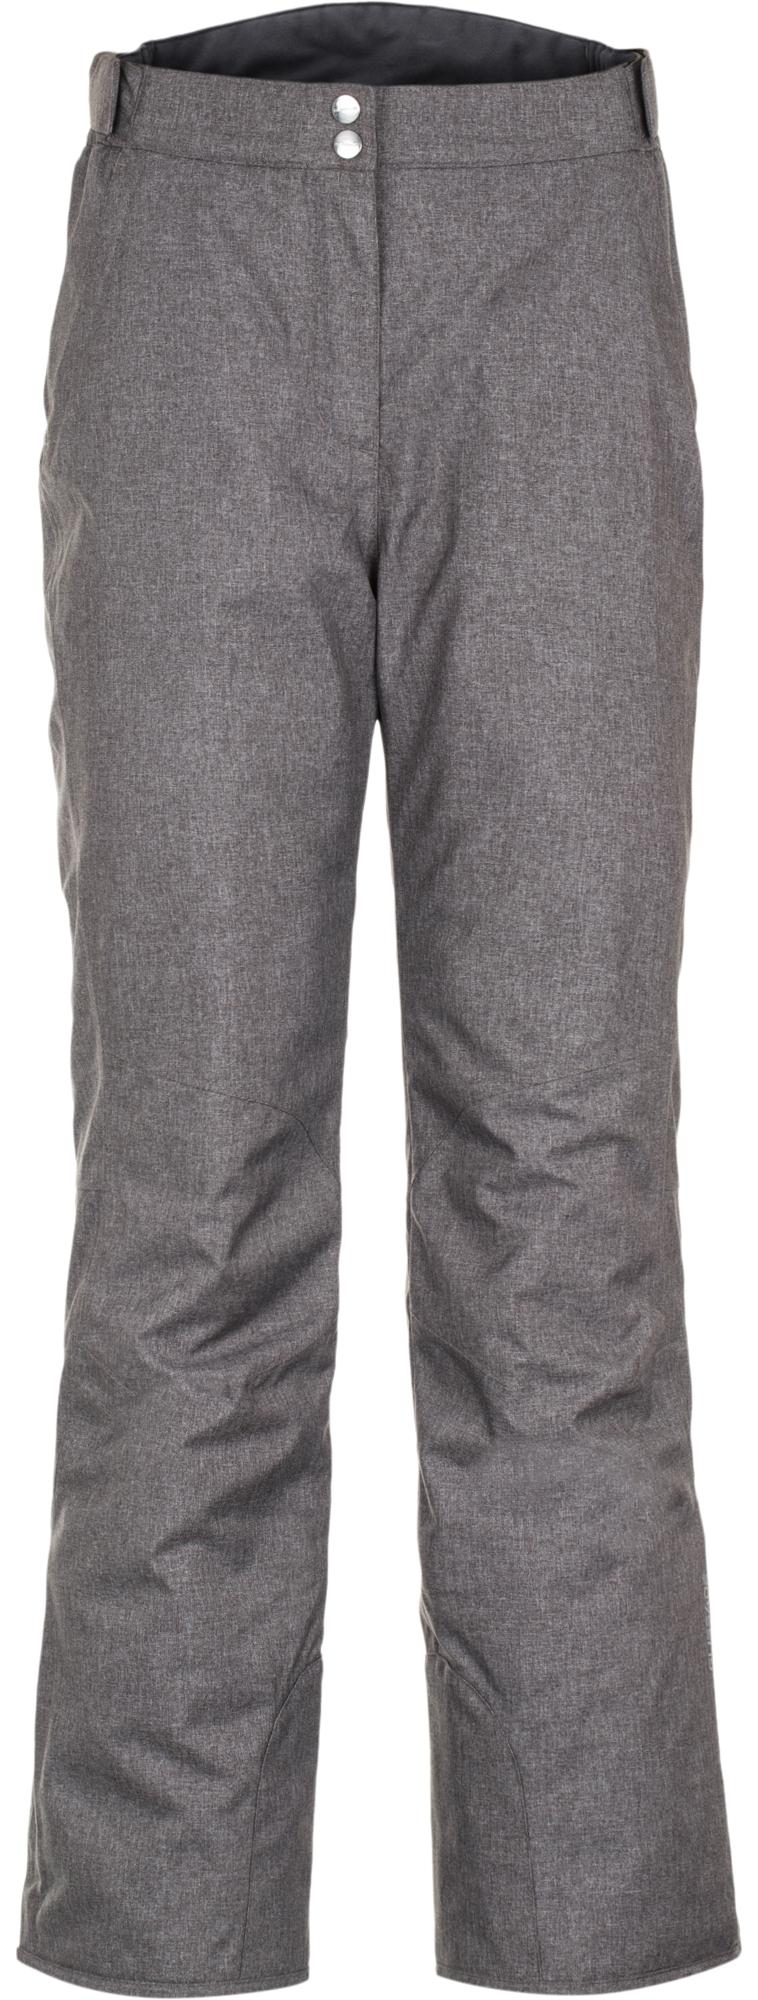 Glissade Брюки утепленные женские Glissade, размер 56 брюки утепленные